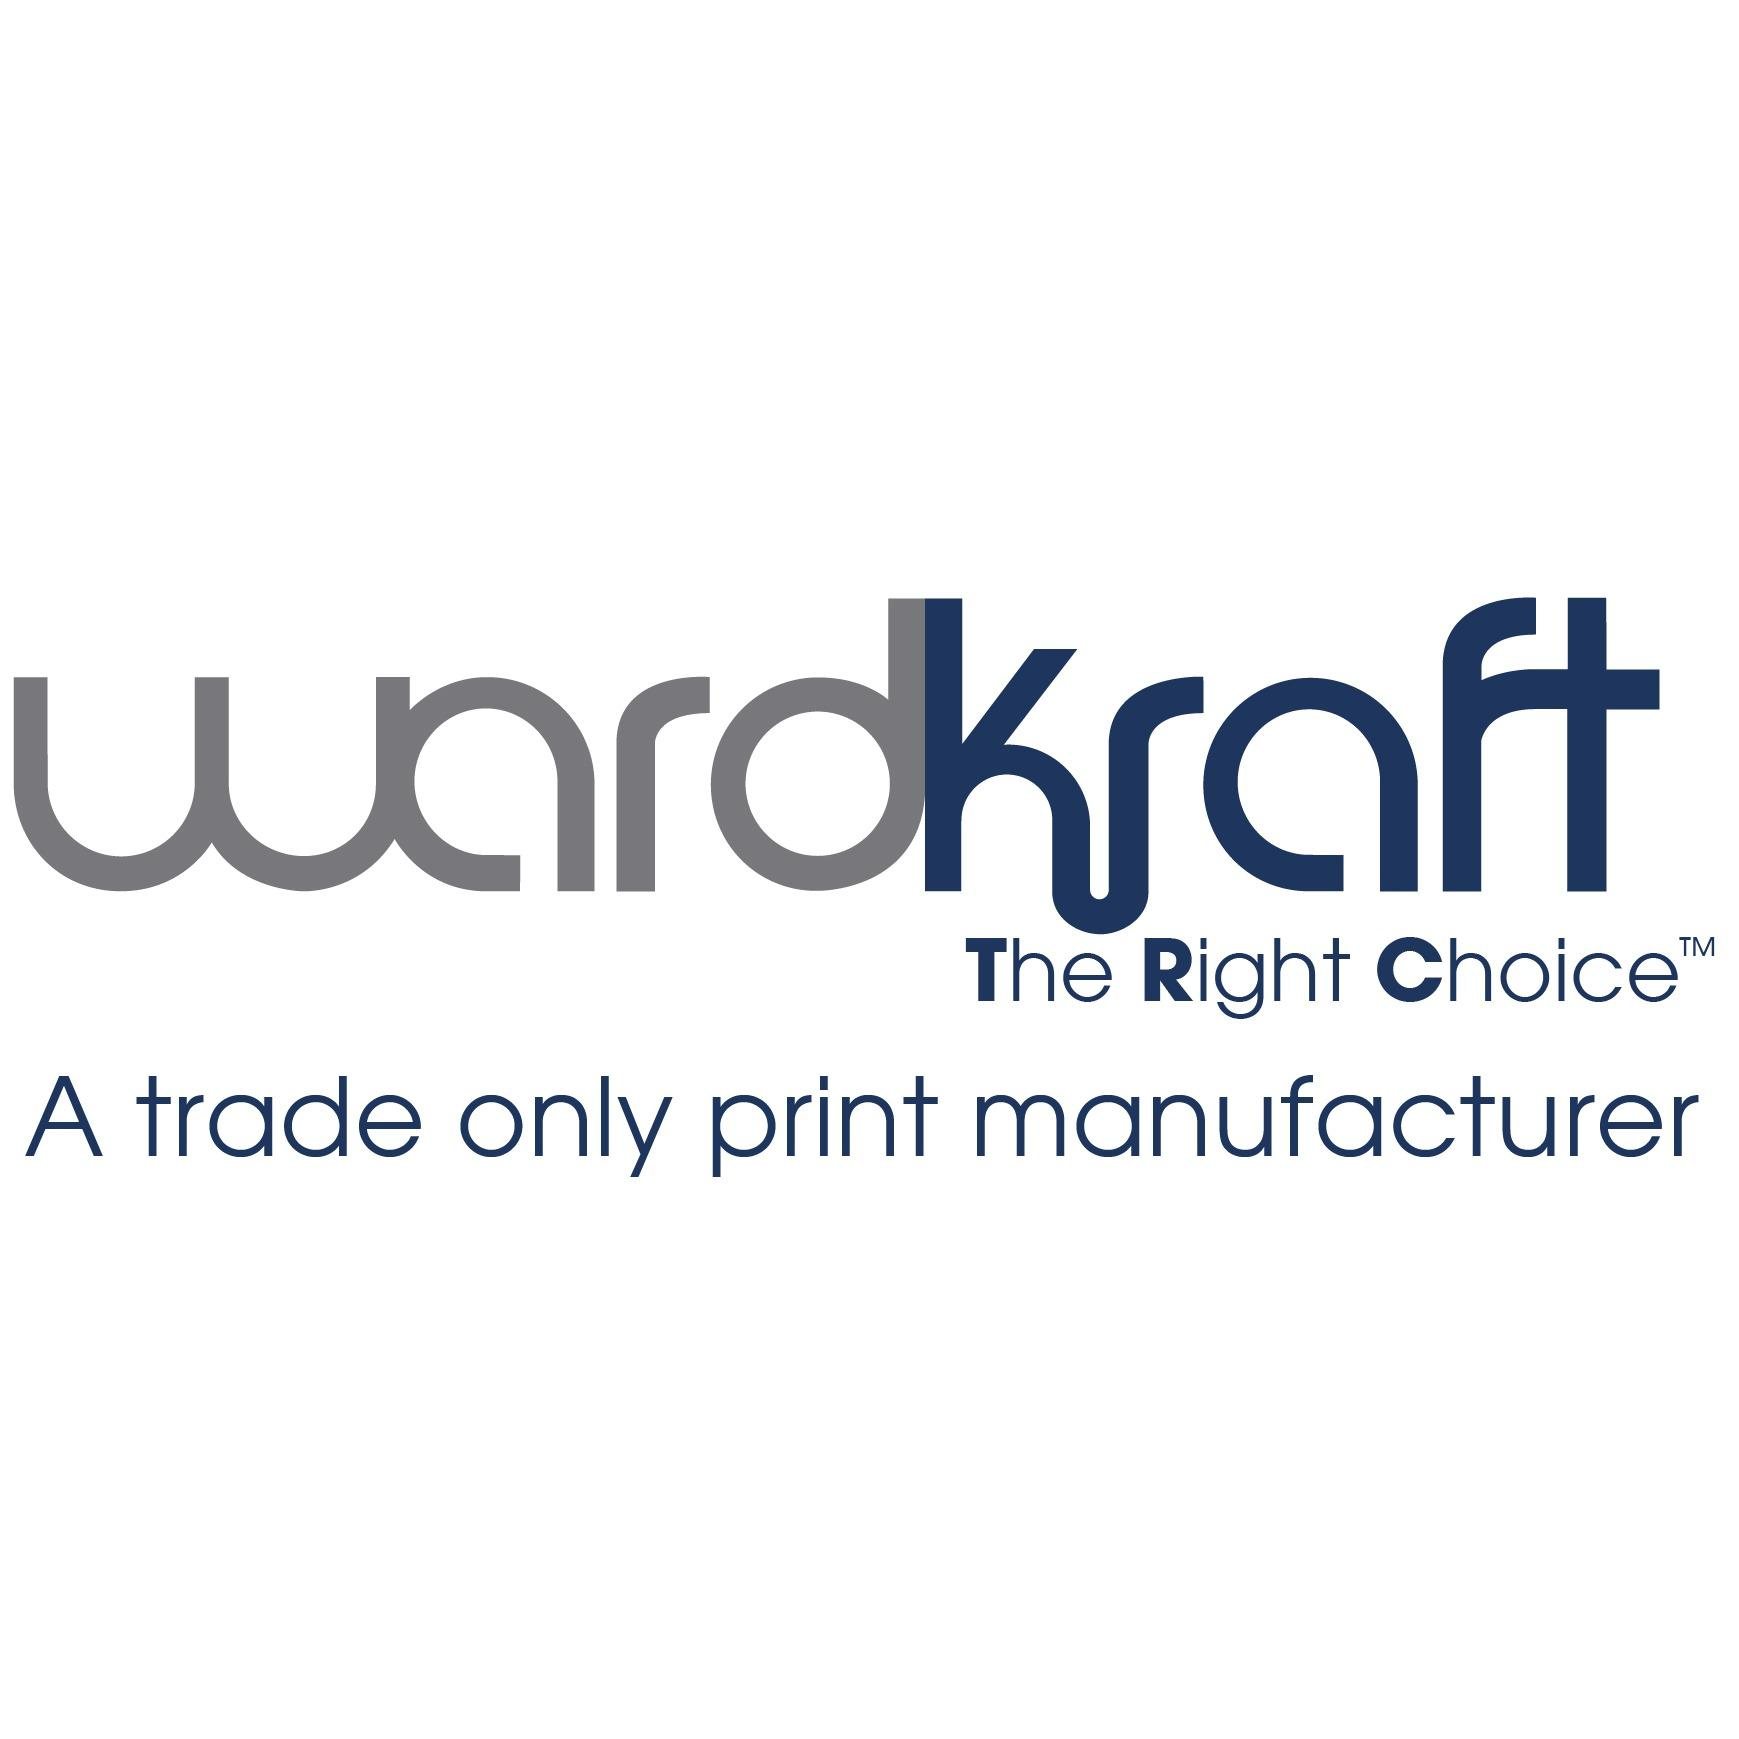 Ward/Kraft Inc.